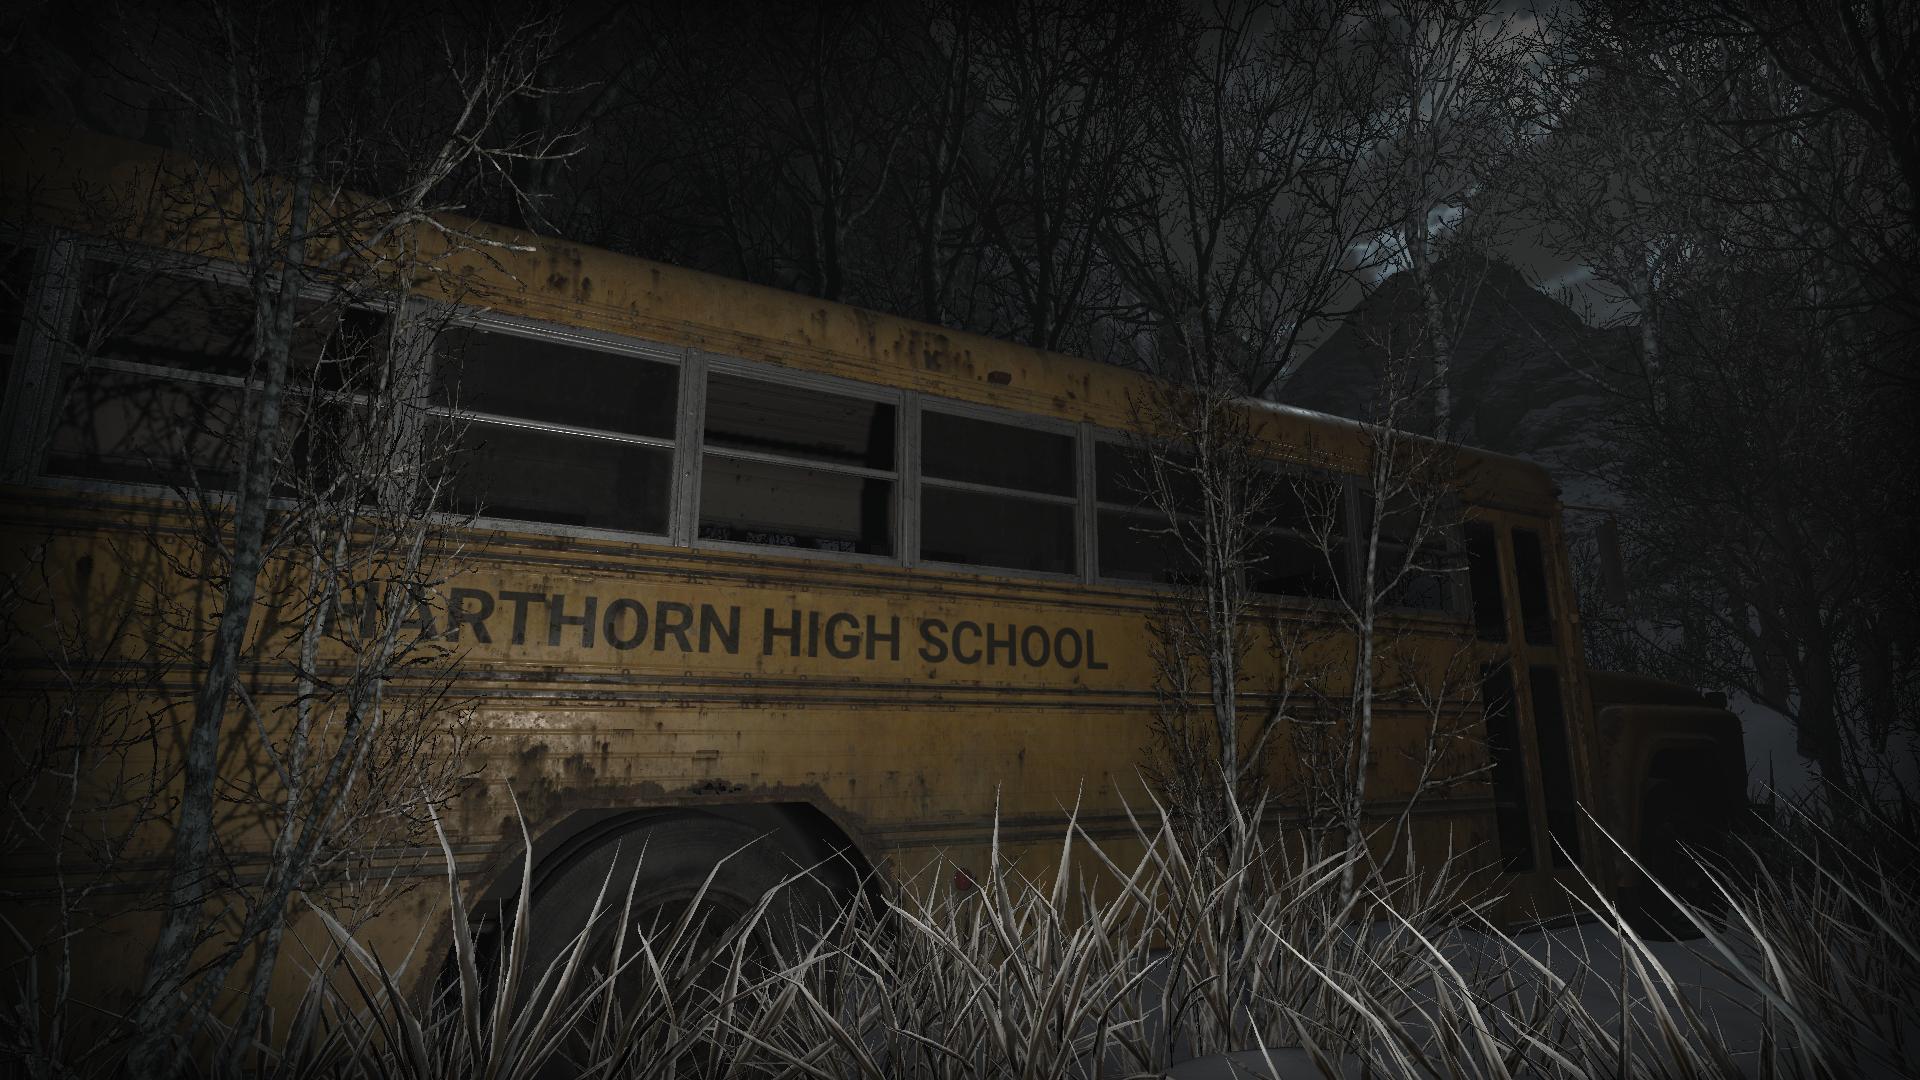 Harthorn Screenshots 04